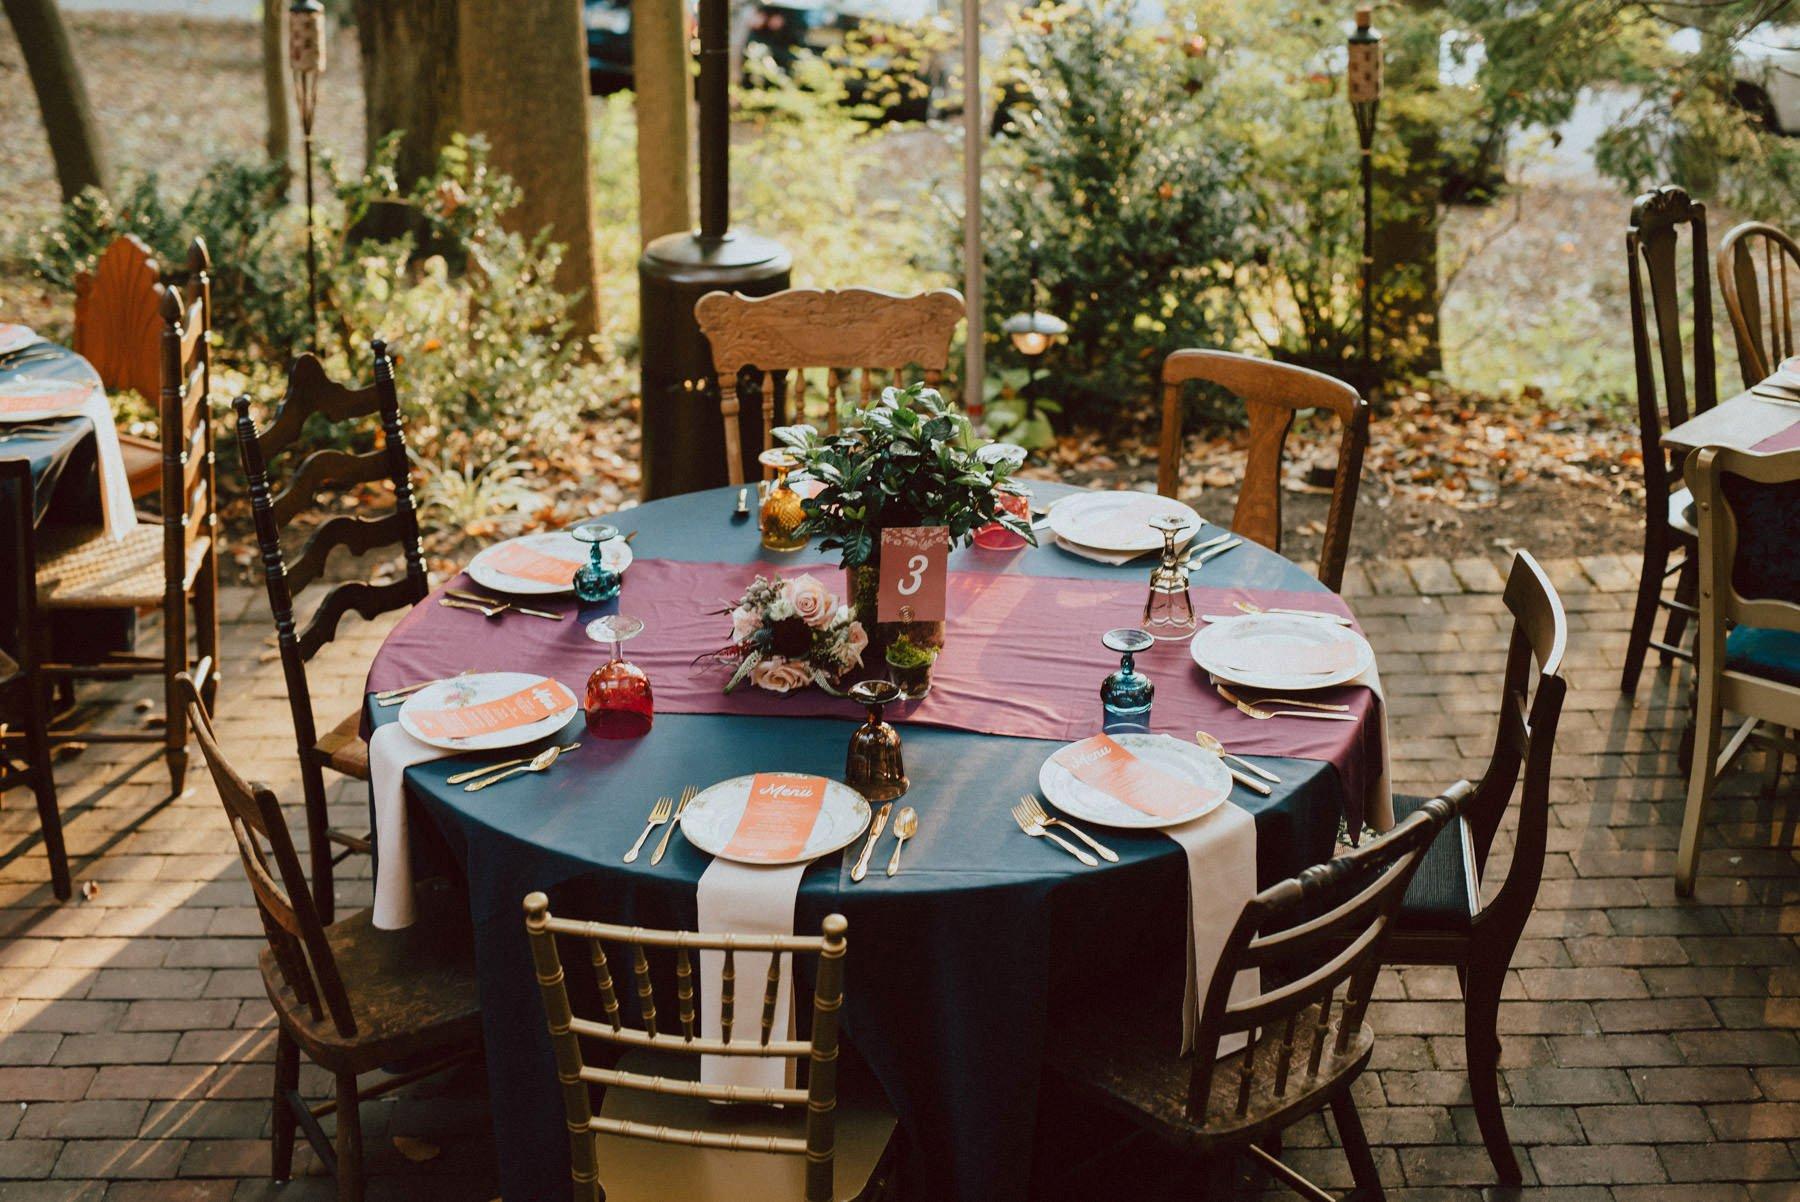 faunbrook-bed-and-breakfast-wedding-96.jpg